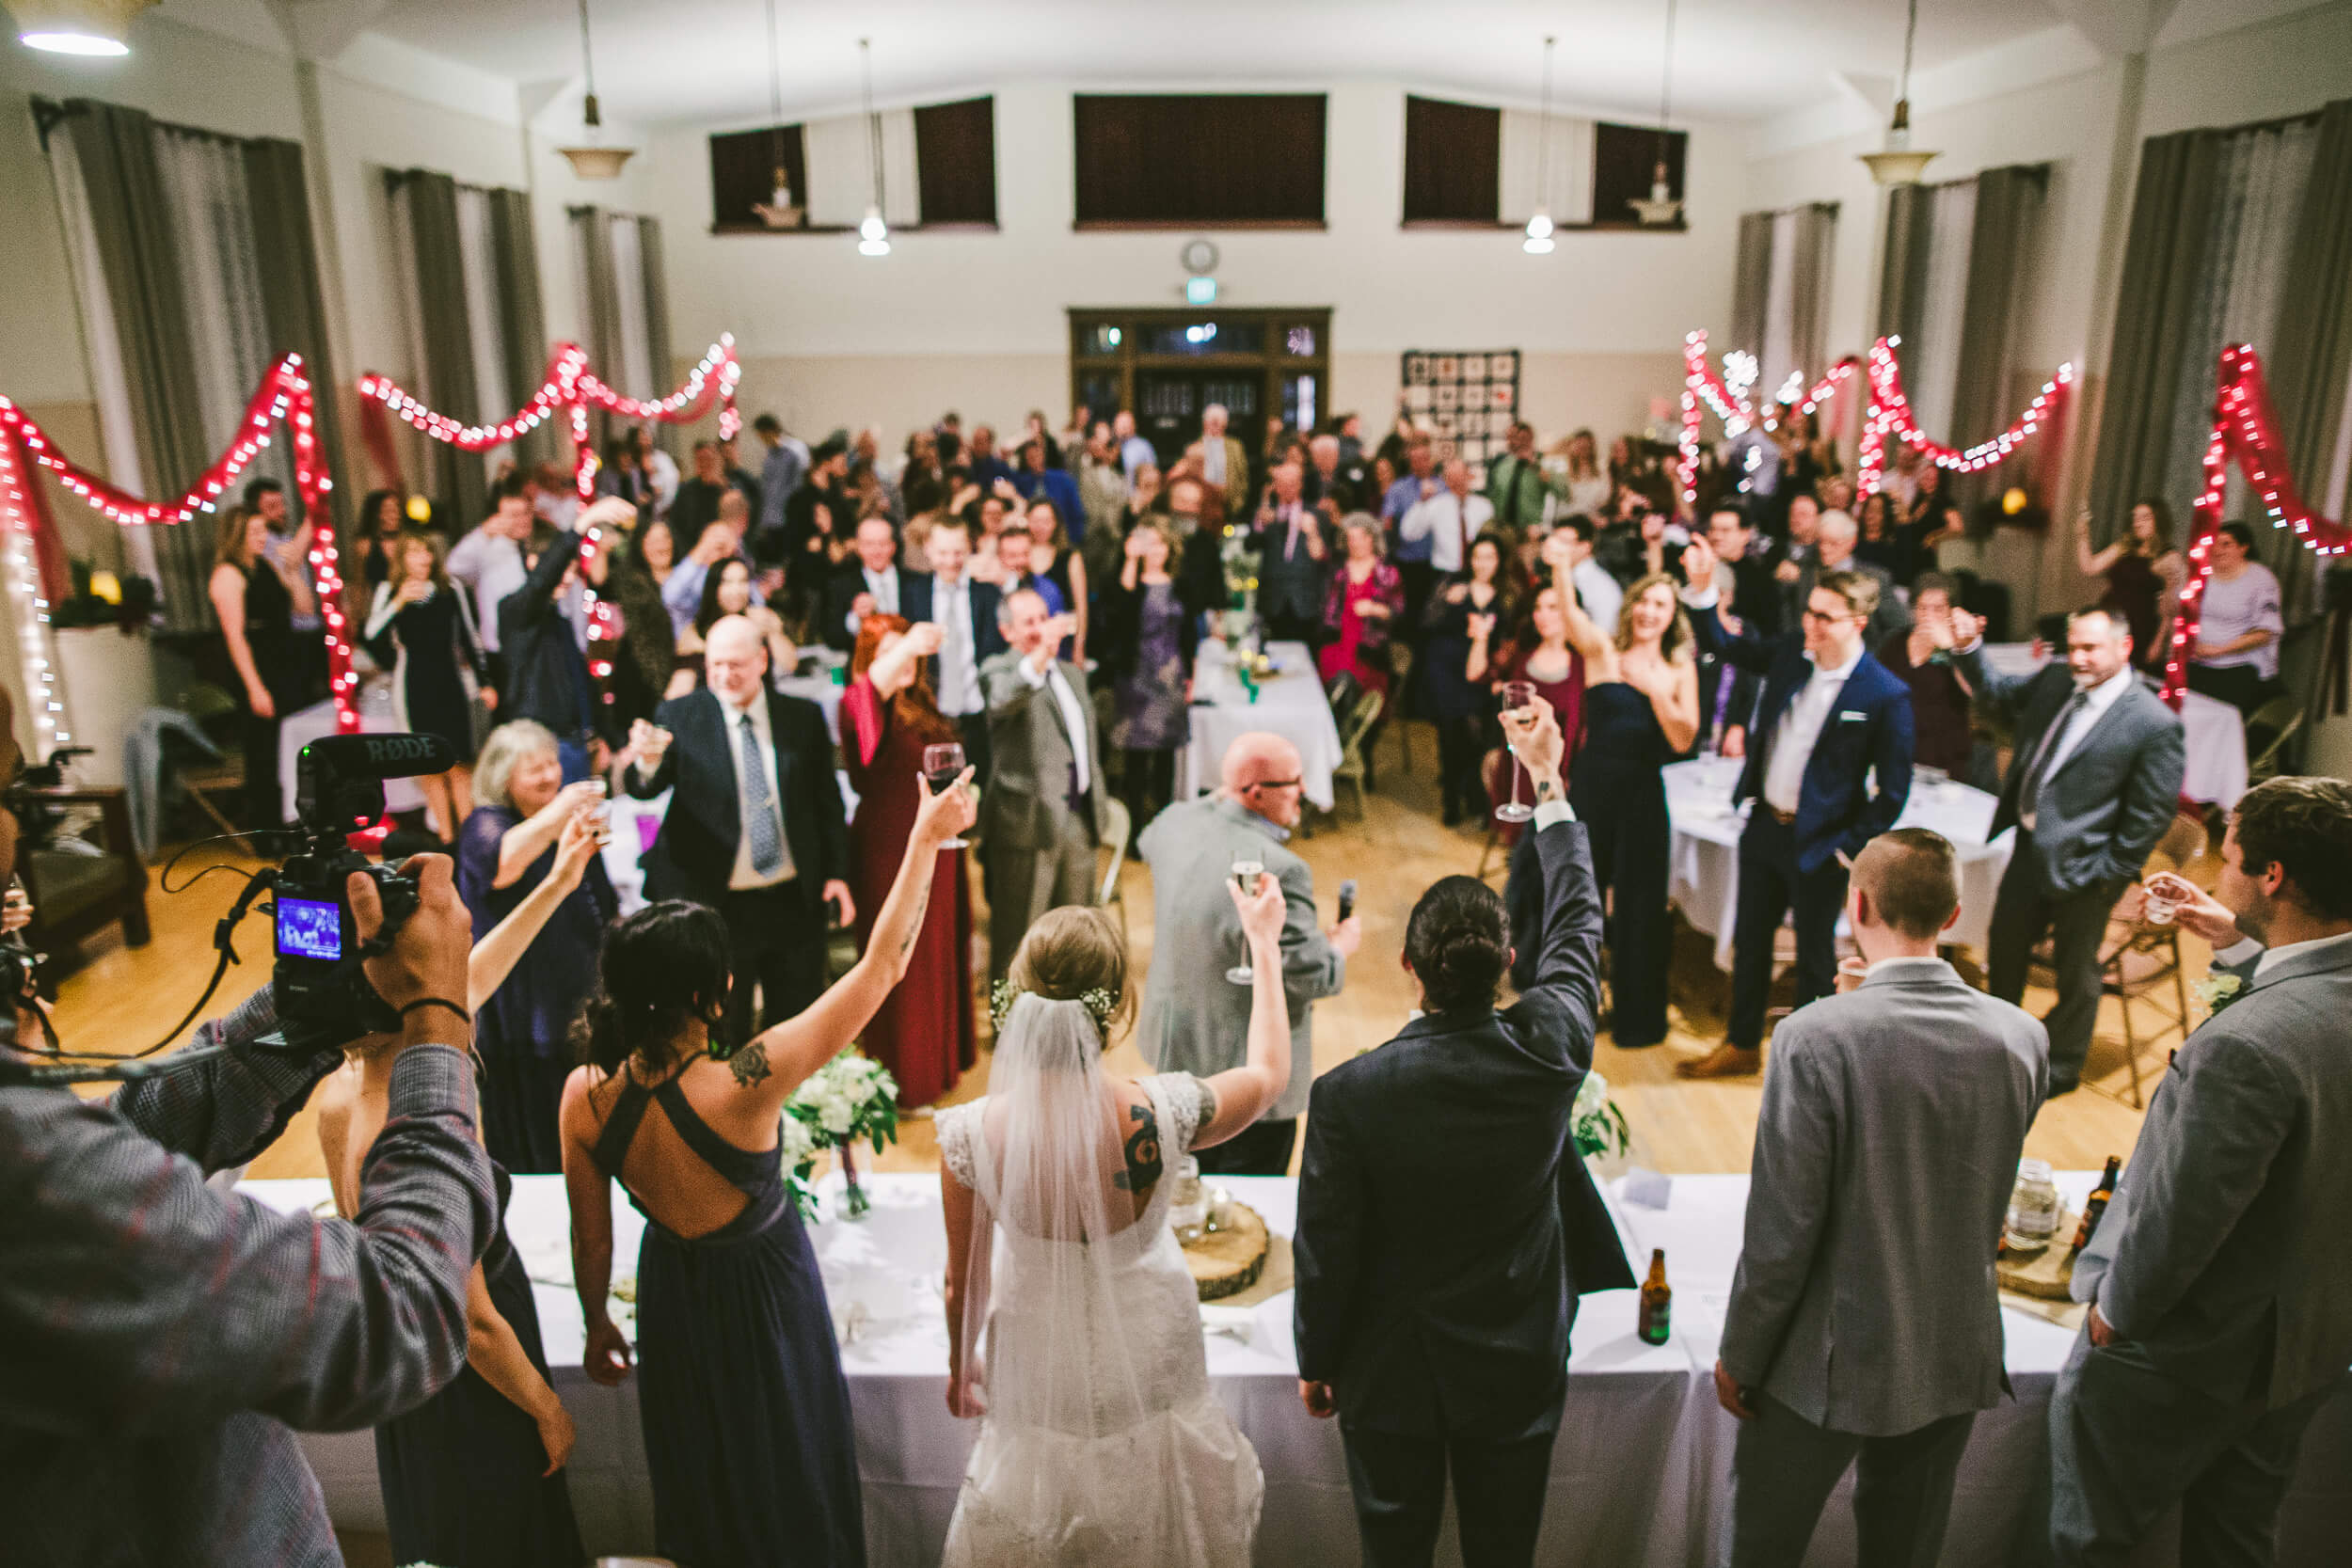 mukogawa winter wedding in spokane (267).jpg